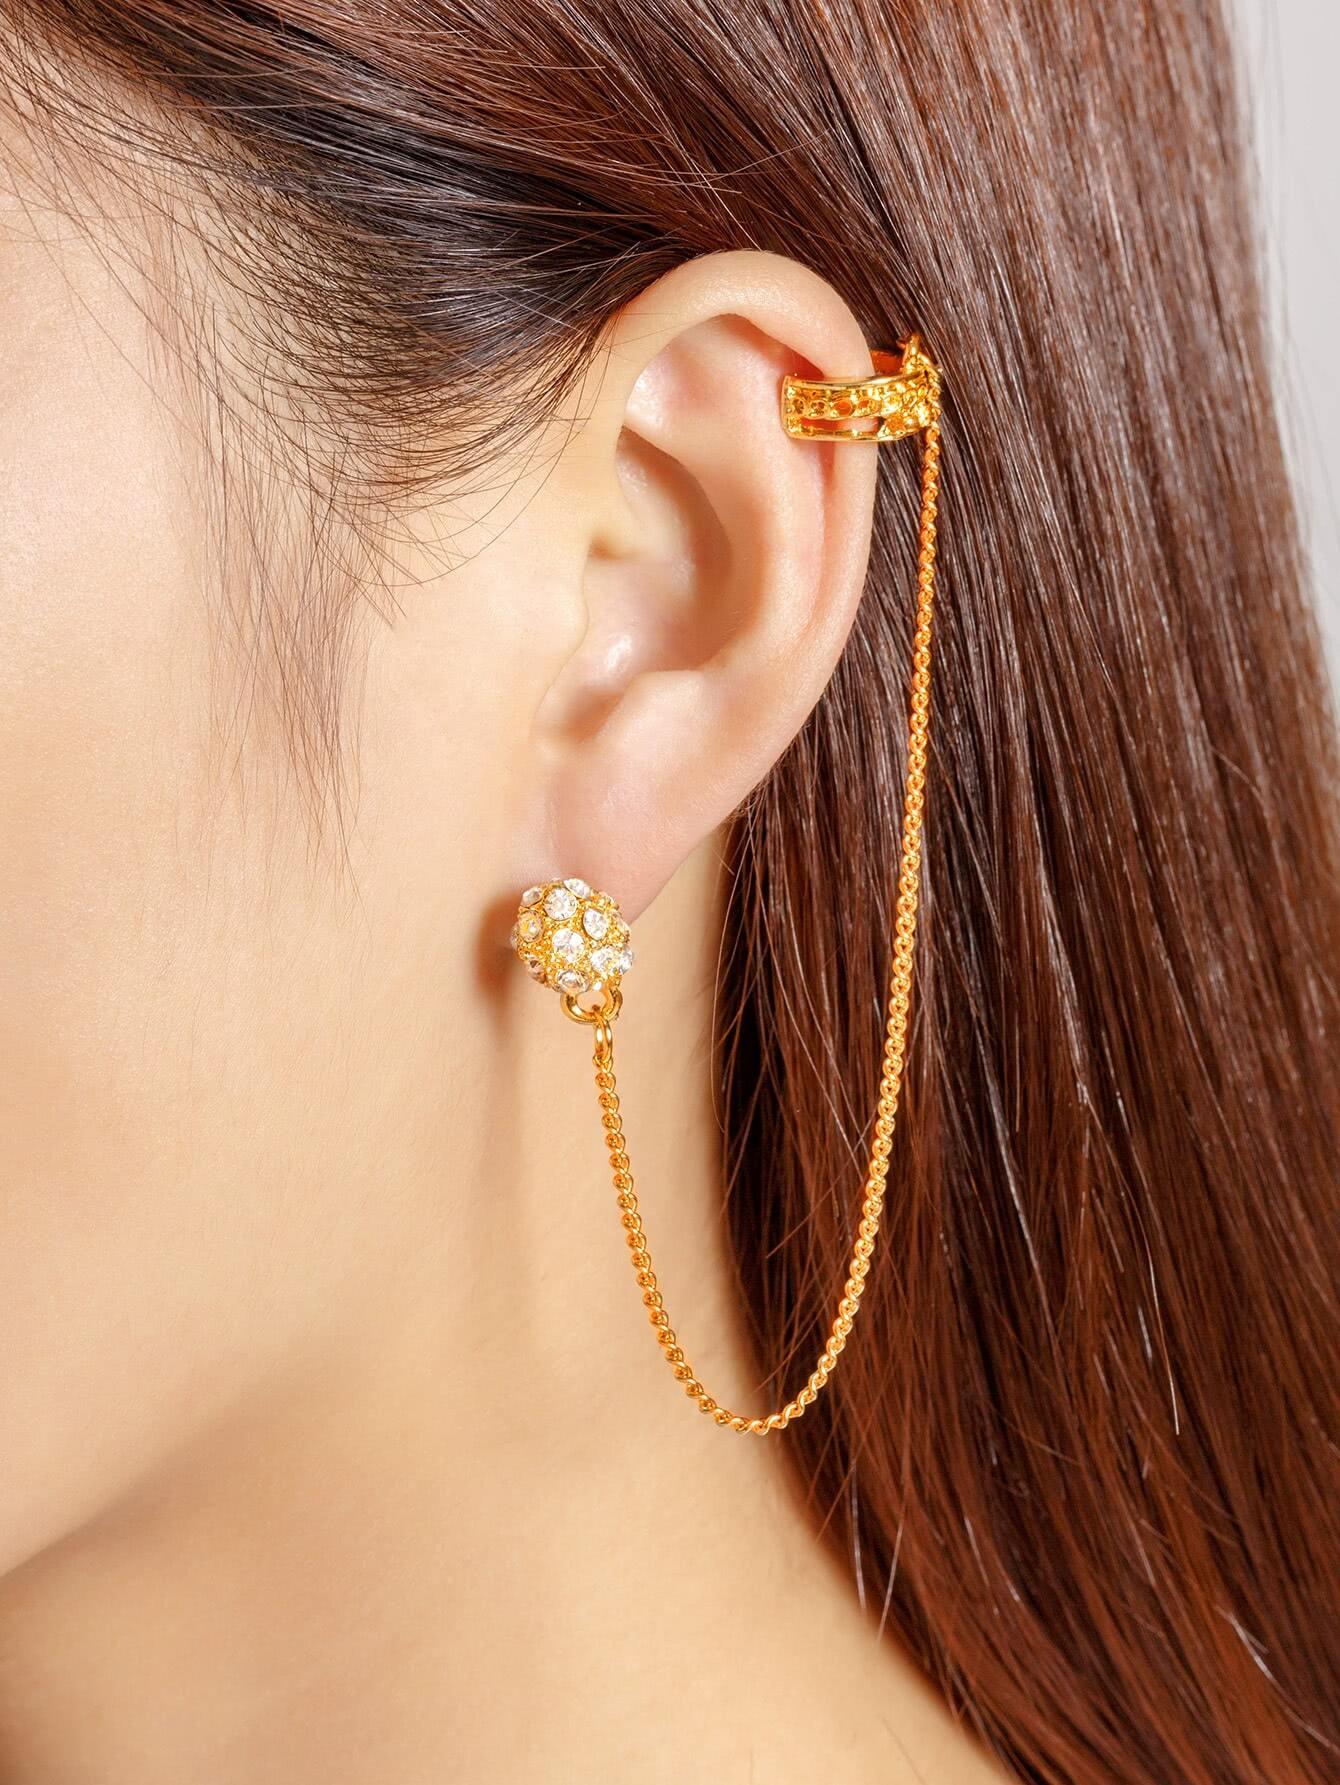 Rhinestone Chain Design Ear Cuff 1pcs